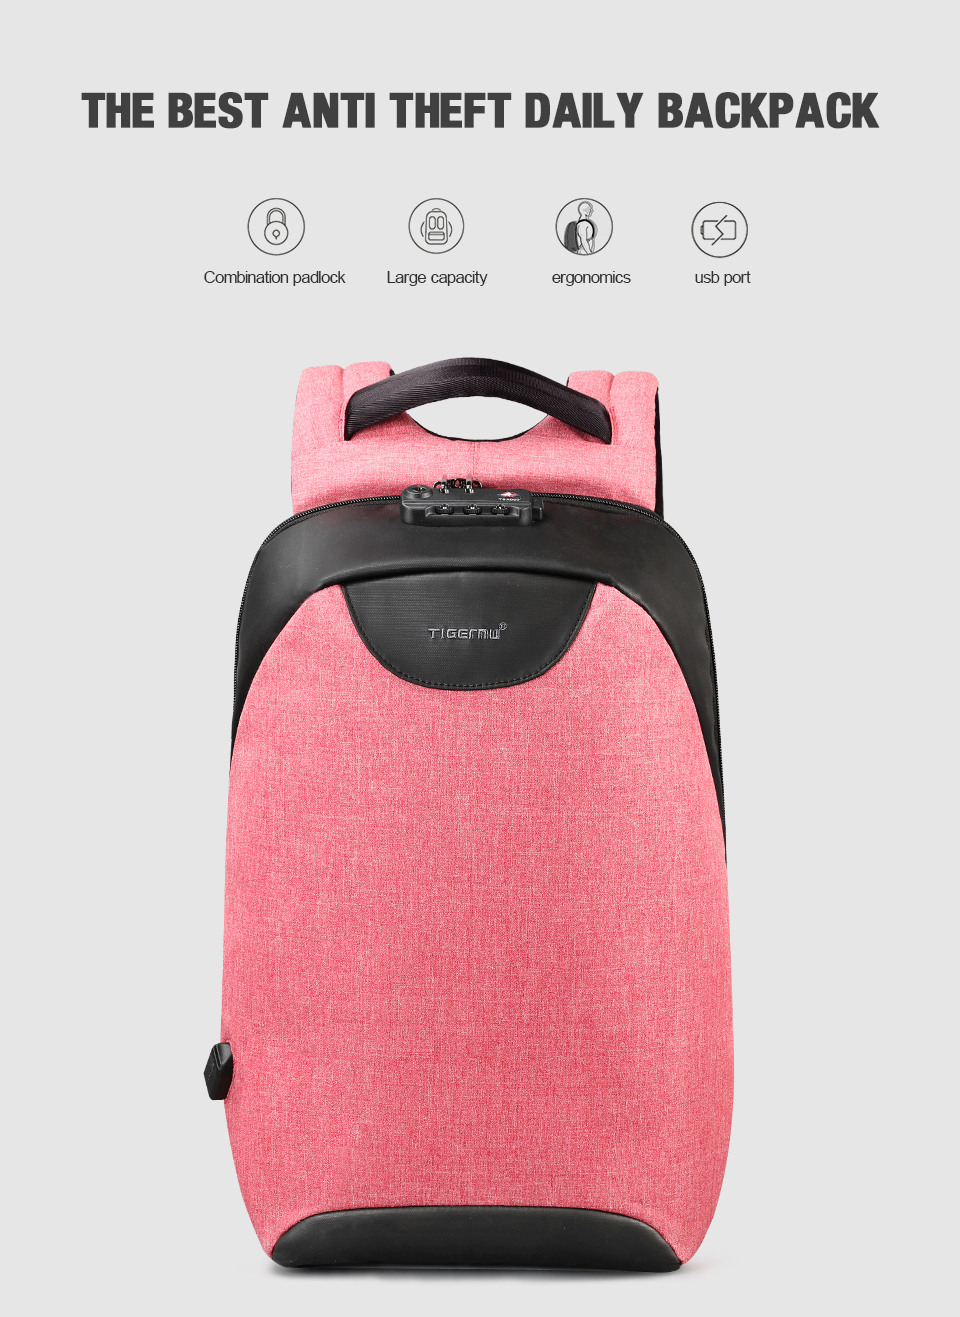 HTB1JT6QEKSSBuNjy0Flq6zBpVXa9 Tigernu Women Anti Theft TSA Lock female Laptop Backpack USB Charge School Bag for Teenager girls Feminine Backpacks Bagpack